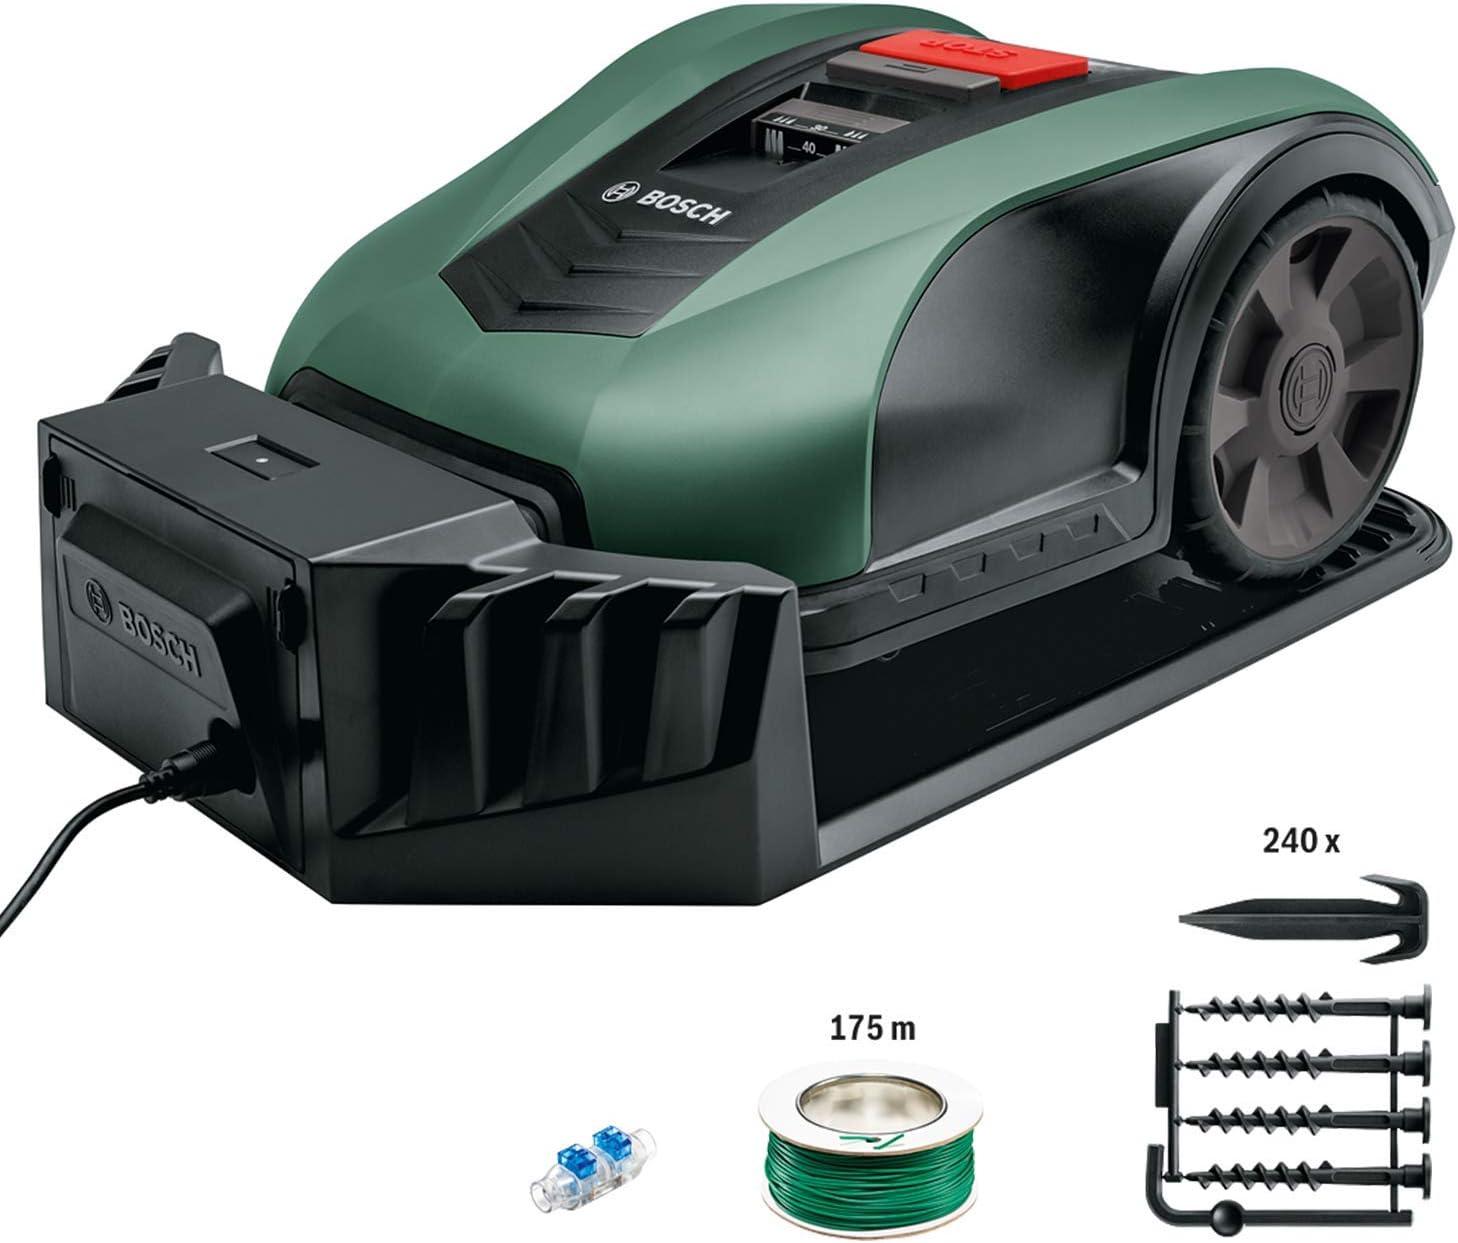 Bosch Lawn and Garden Indego Robot cortacésped ancho de corte 19cm, Verde, 700 m2